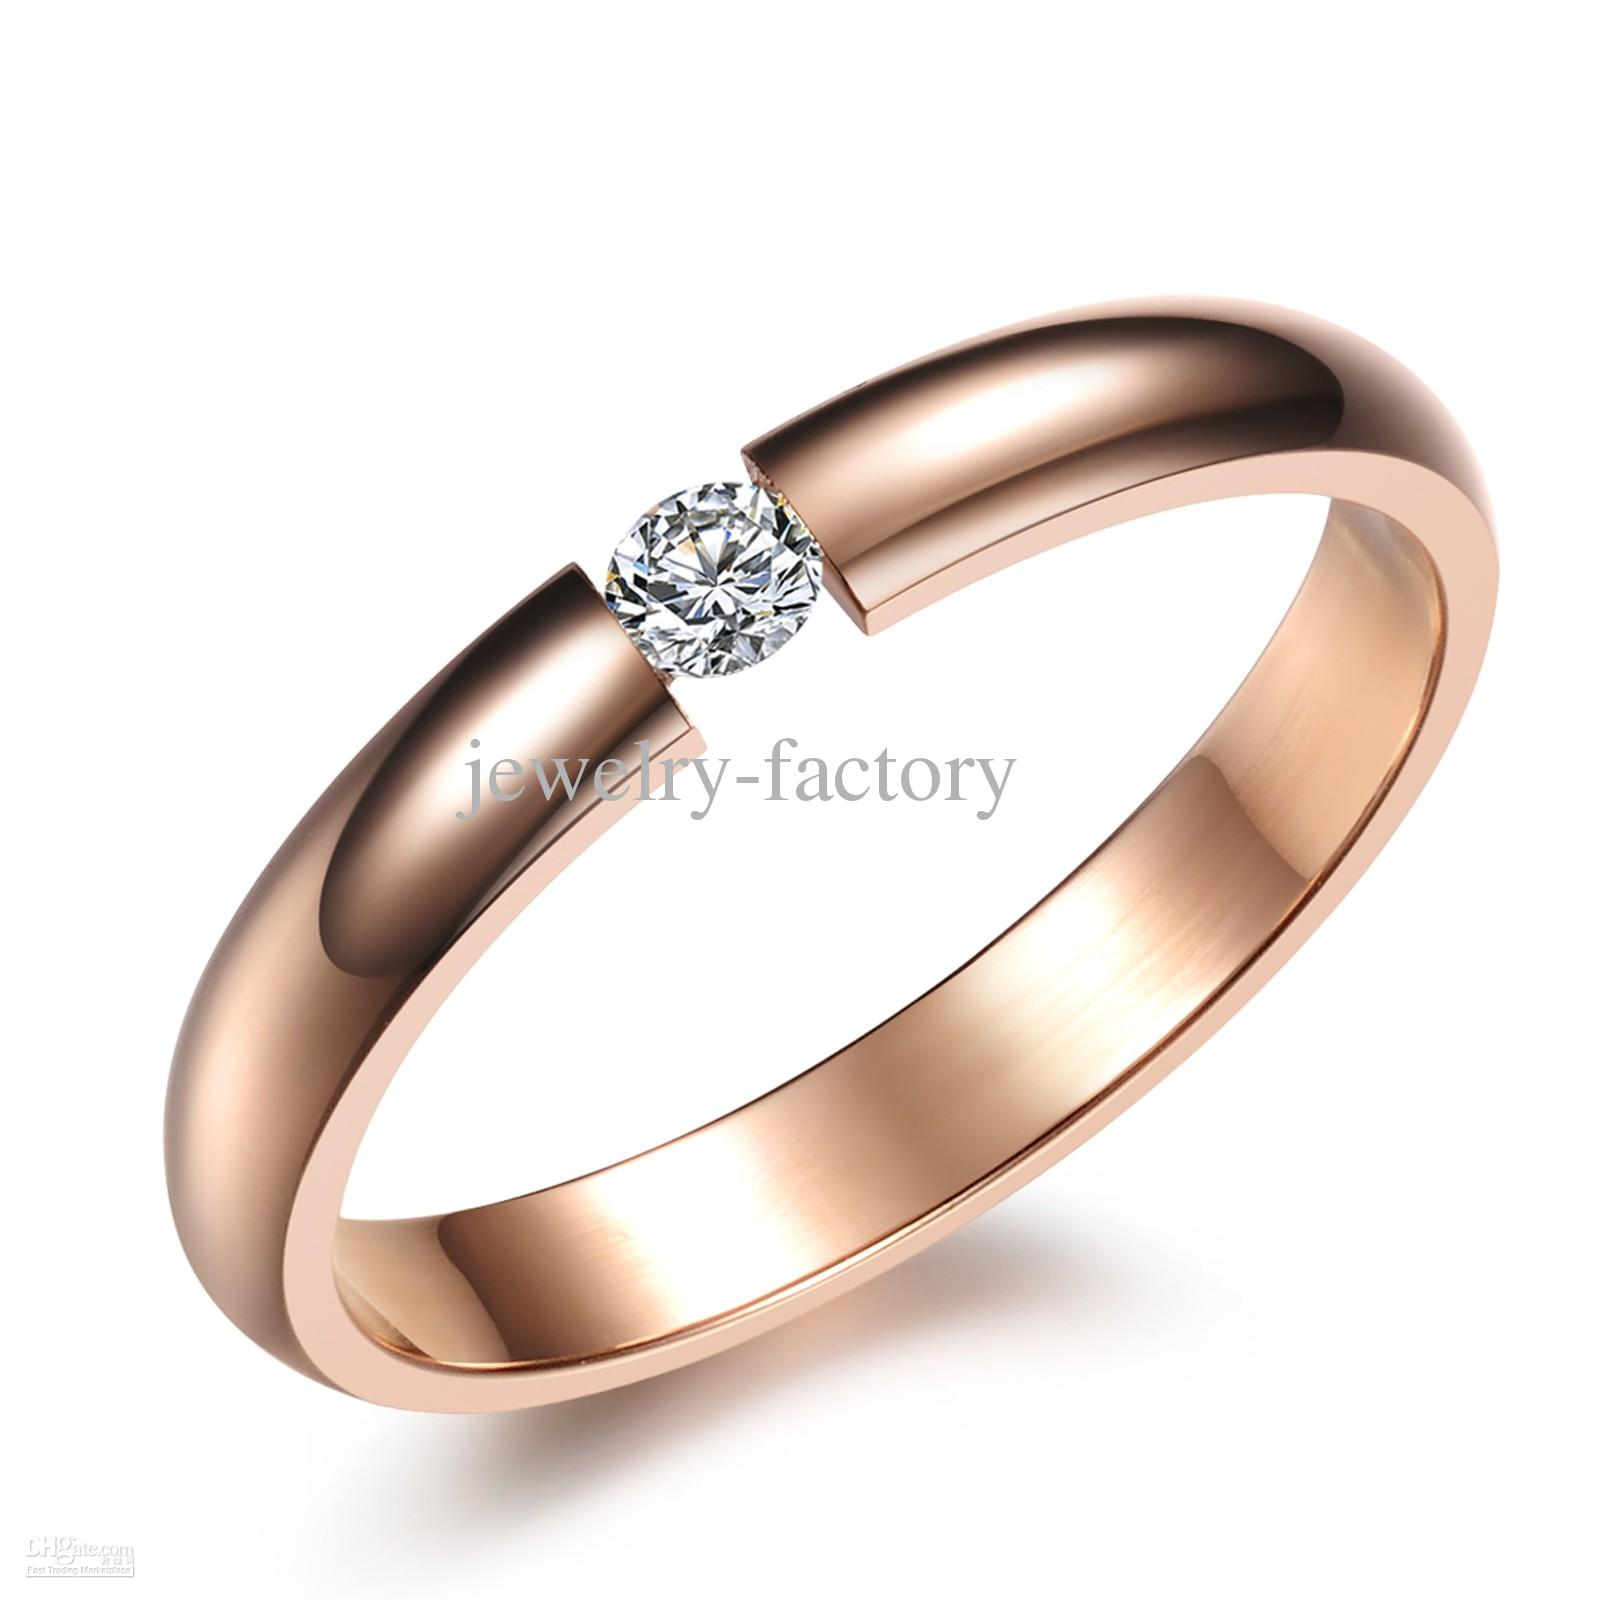 2018 rose gold plating wedding ring diamond engagement ring for